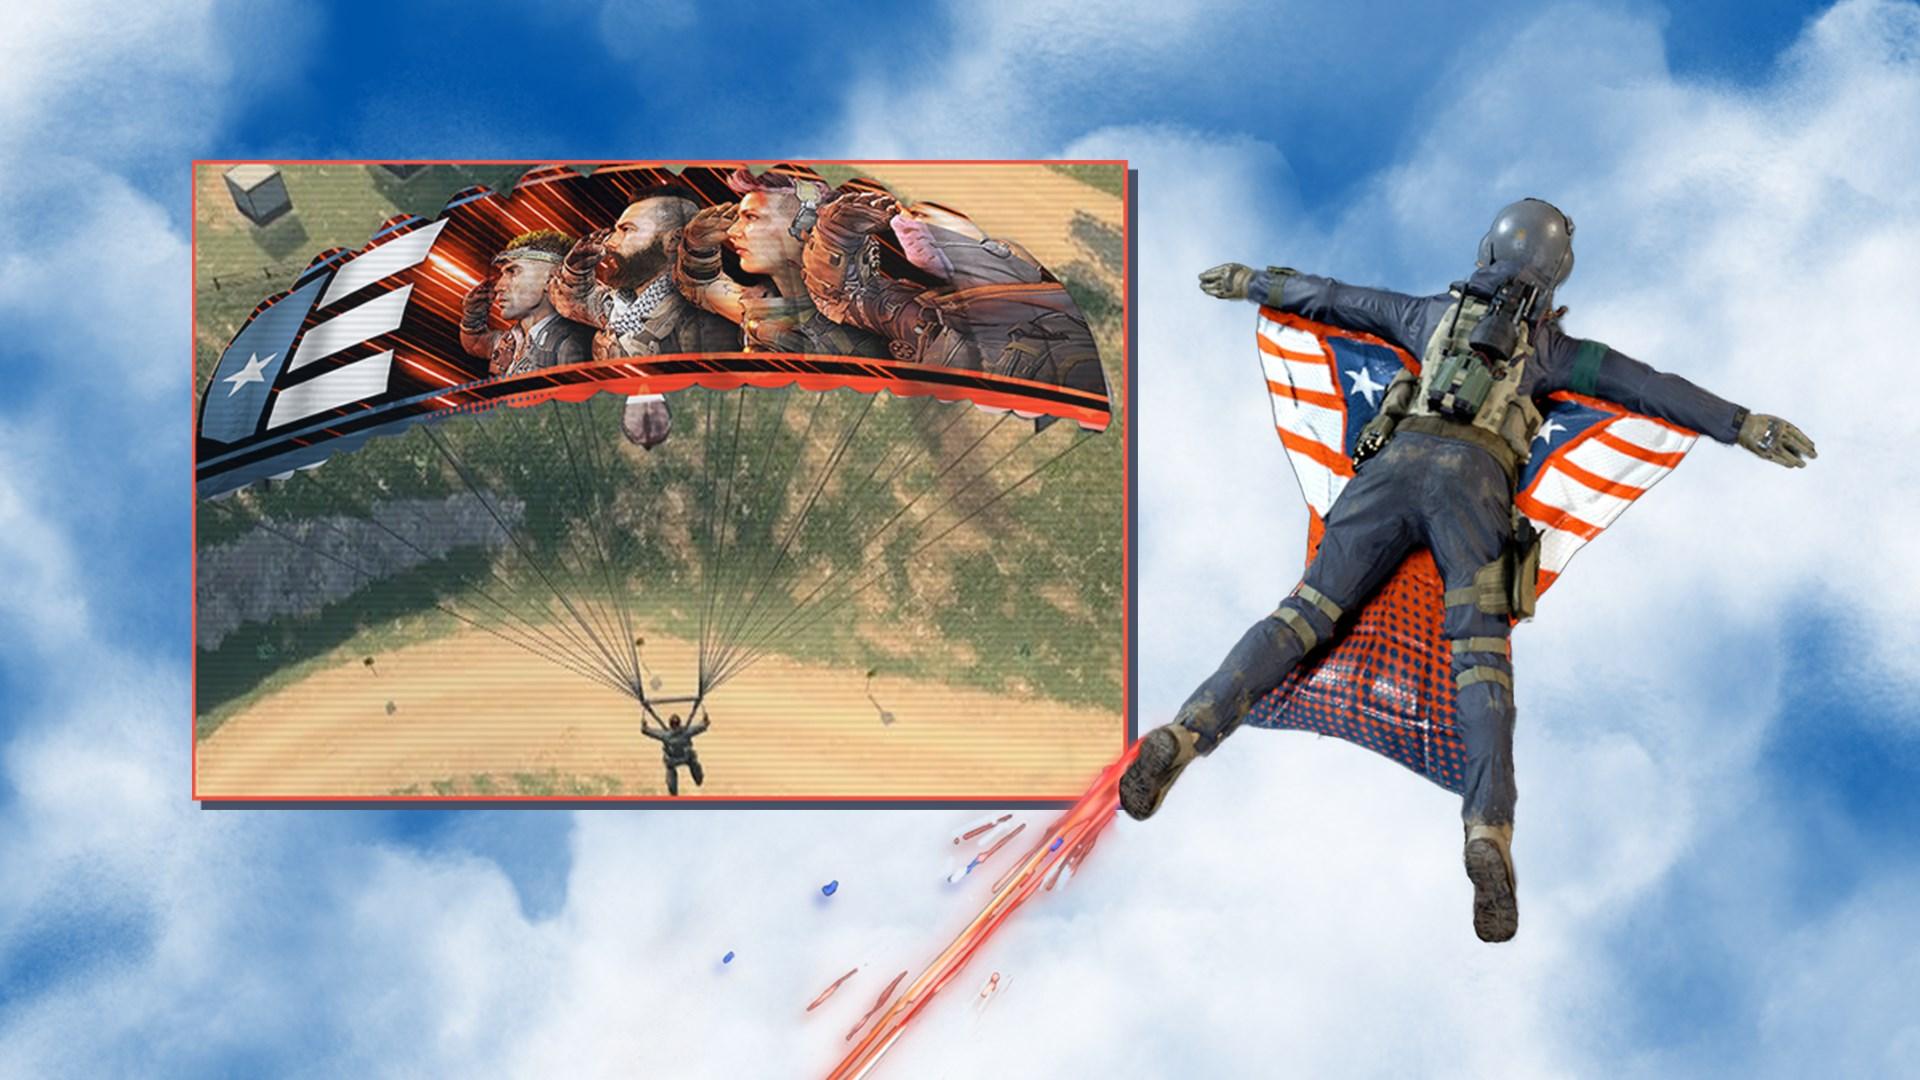 Call of Duty® Black Ops 4 - C.O.D.E. Jump Pack